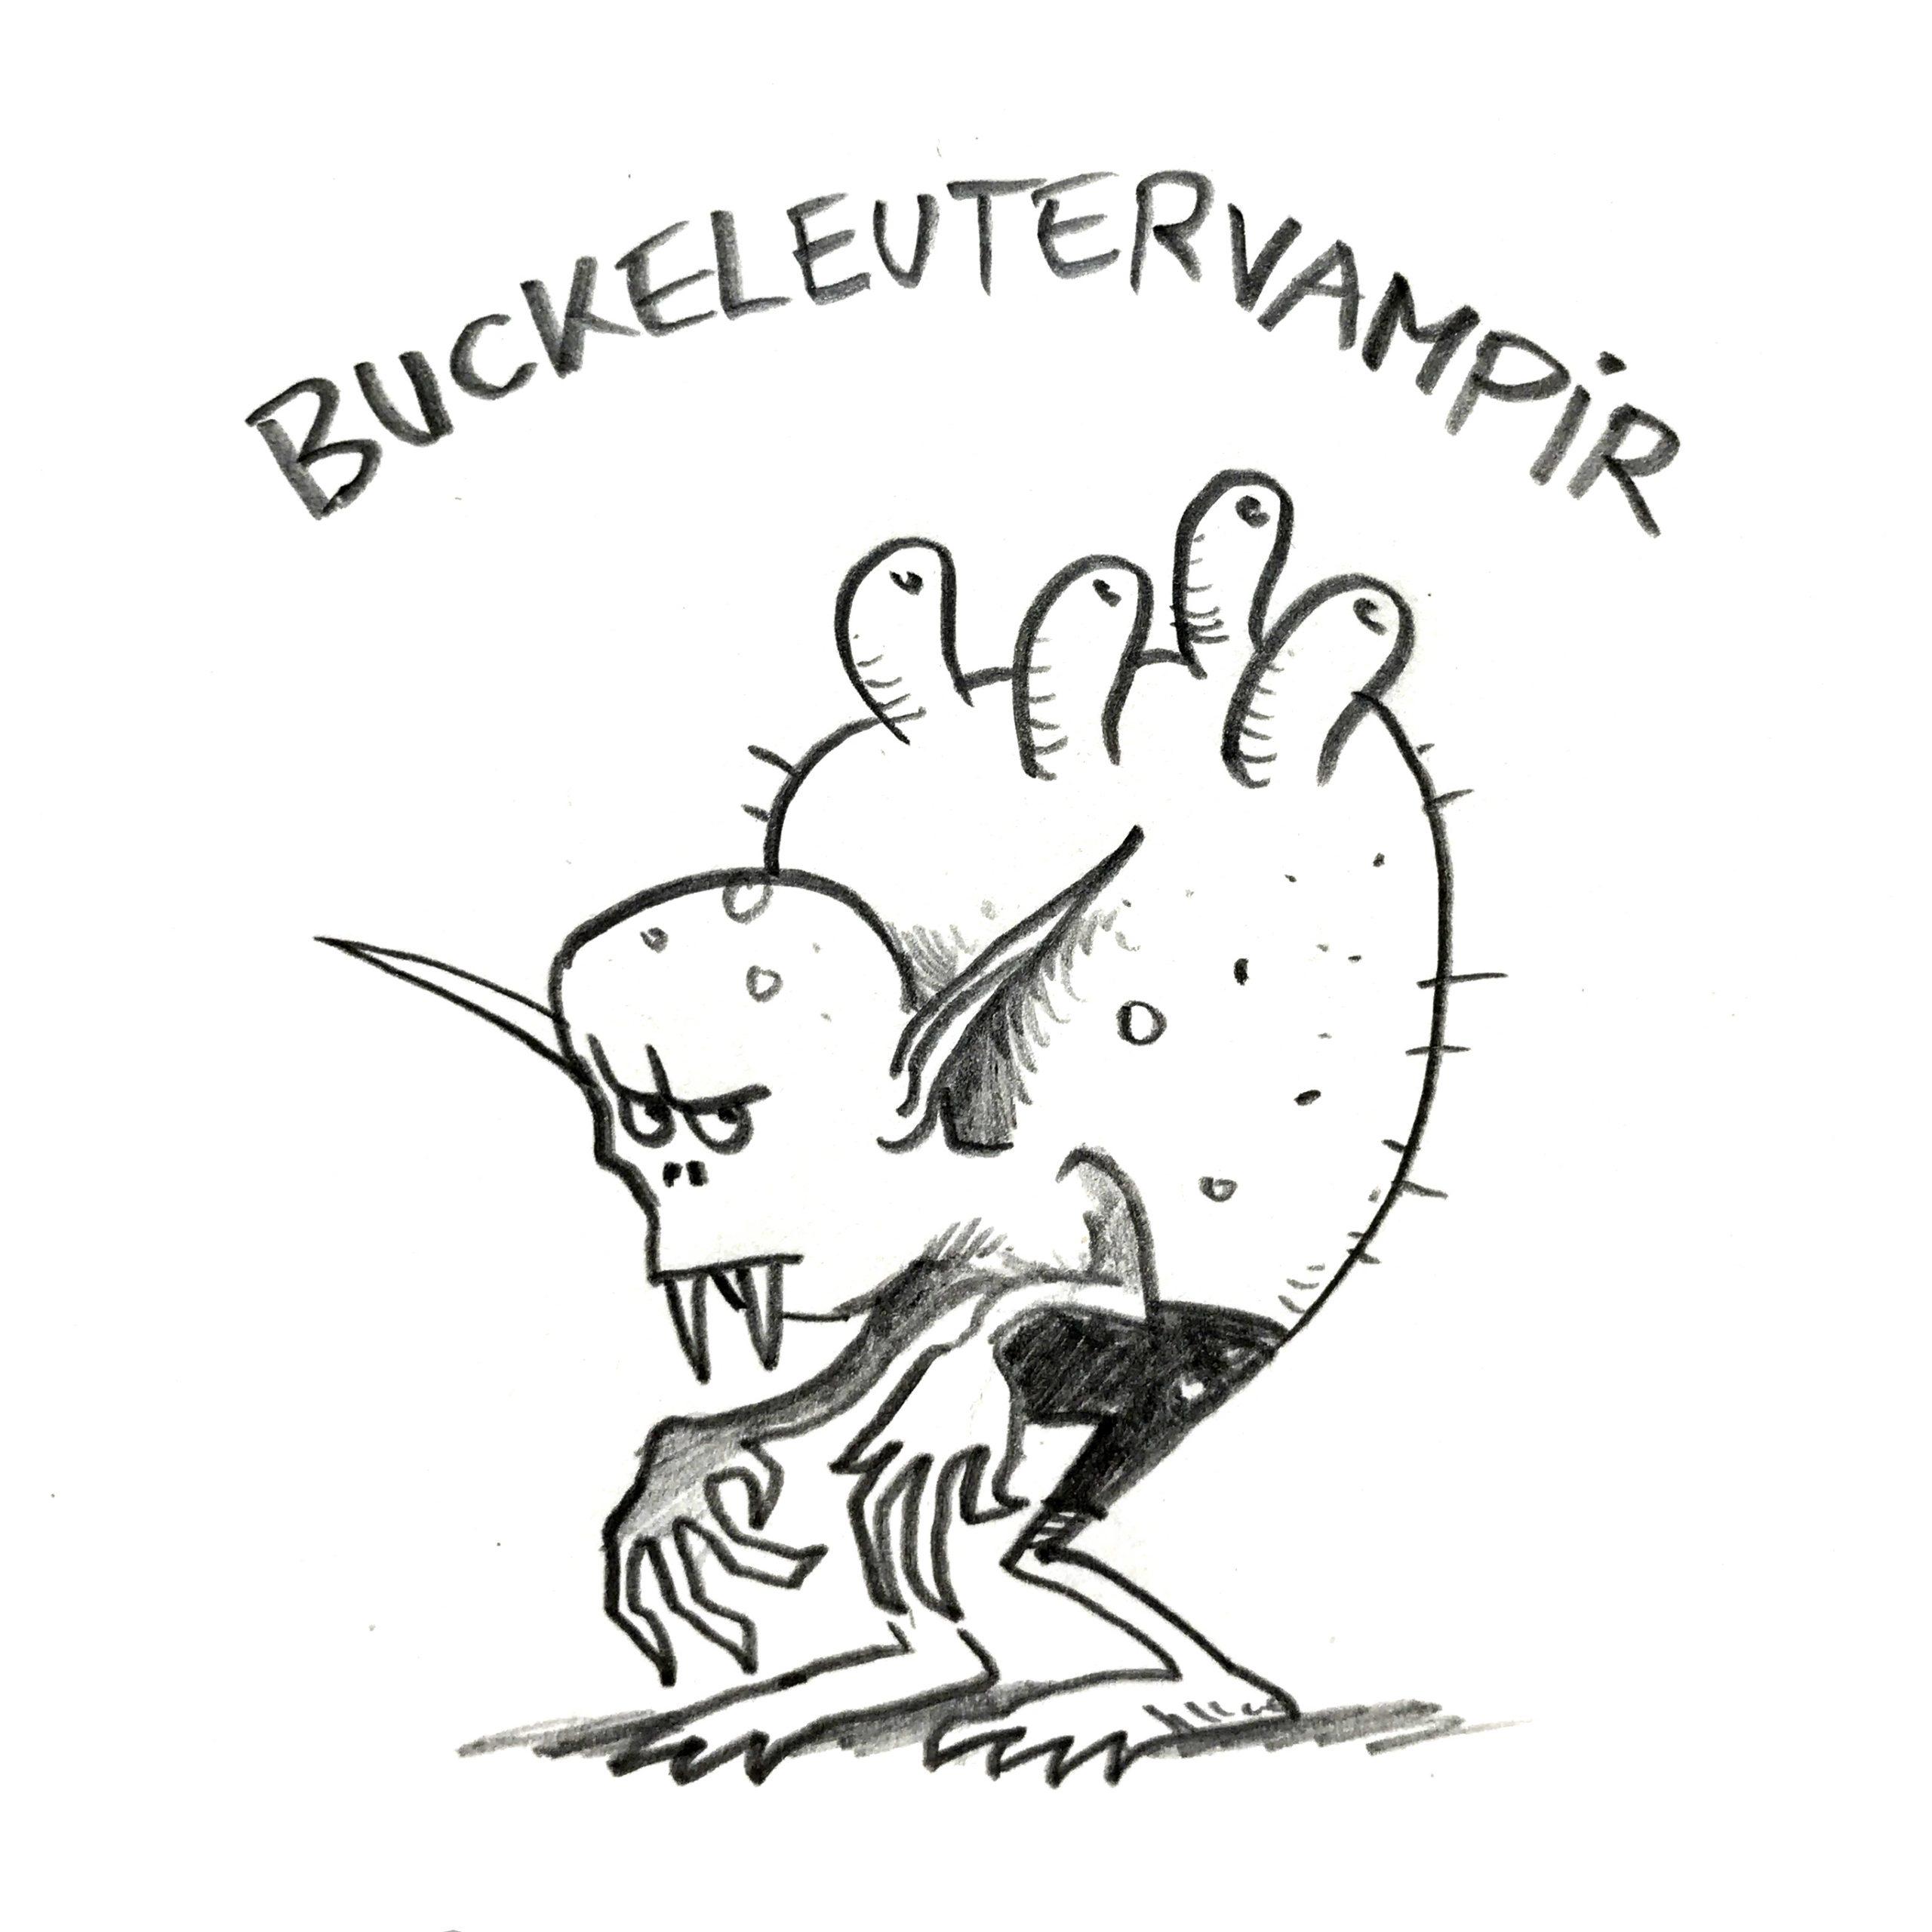 Buckeleutervampir